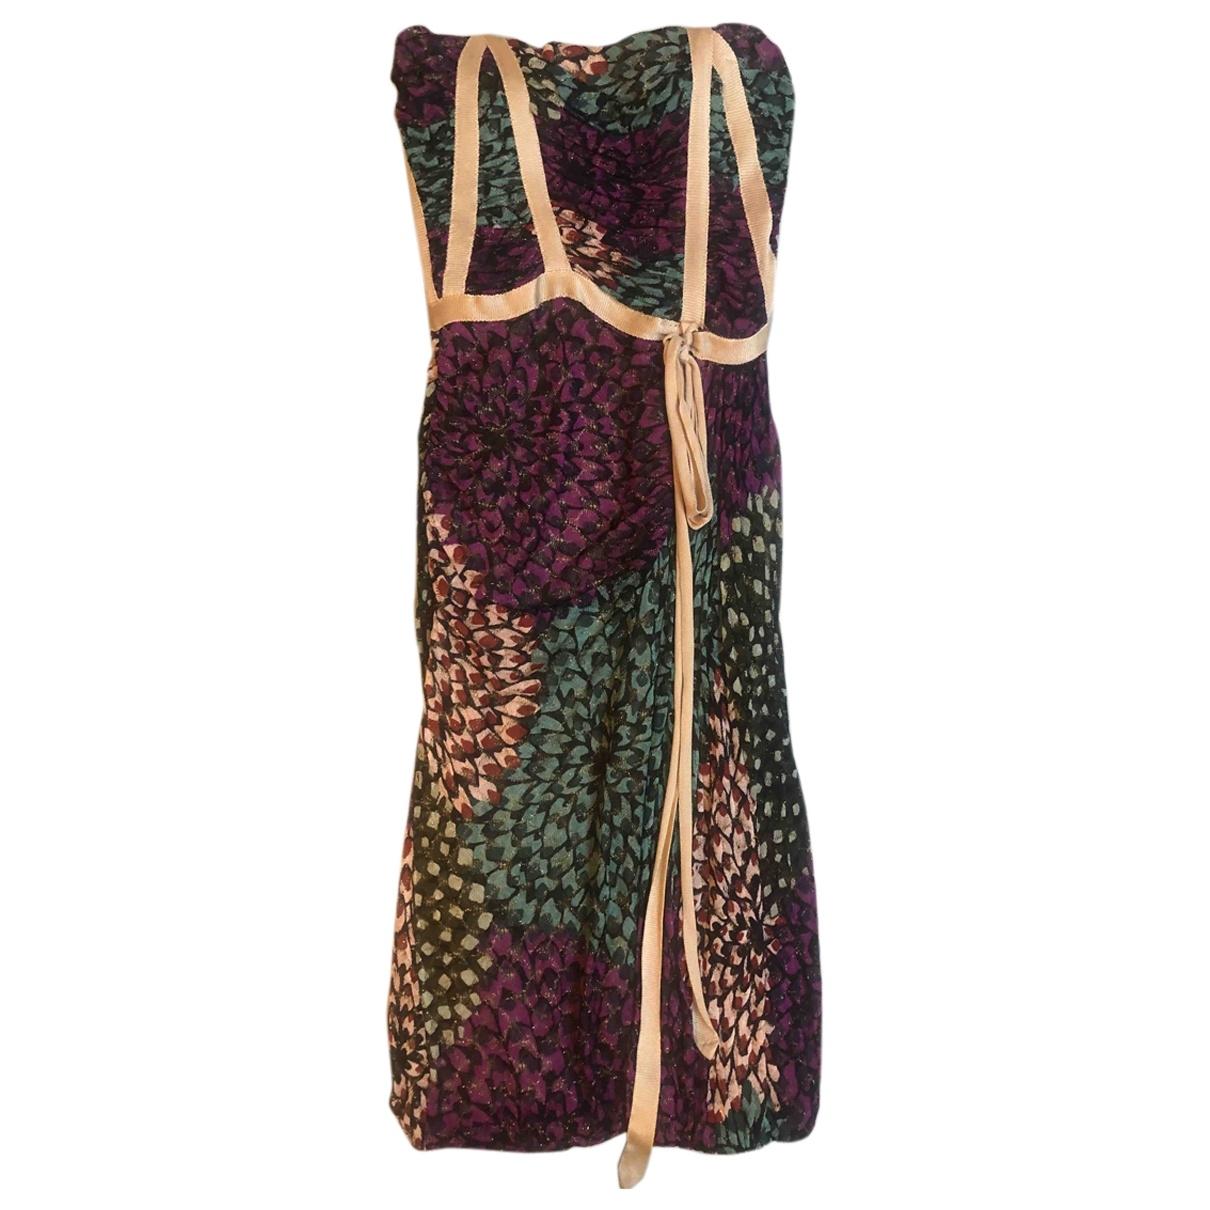 Missoni \N Multicolour Cotton - elasthane dress for Women 40 IT